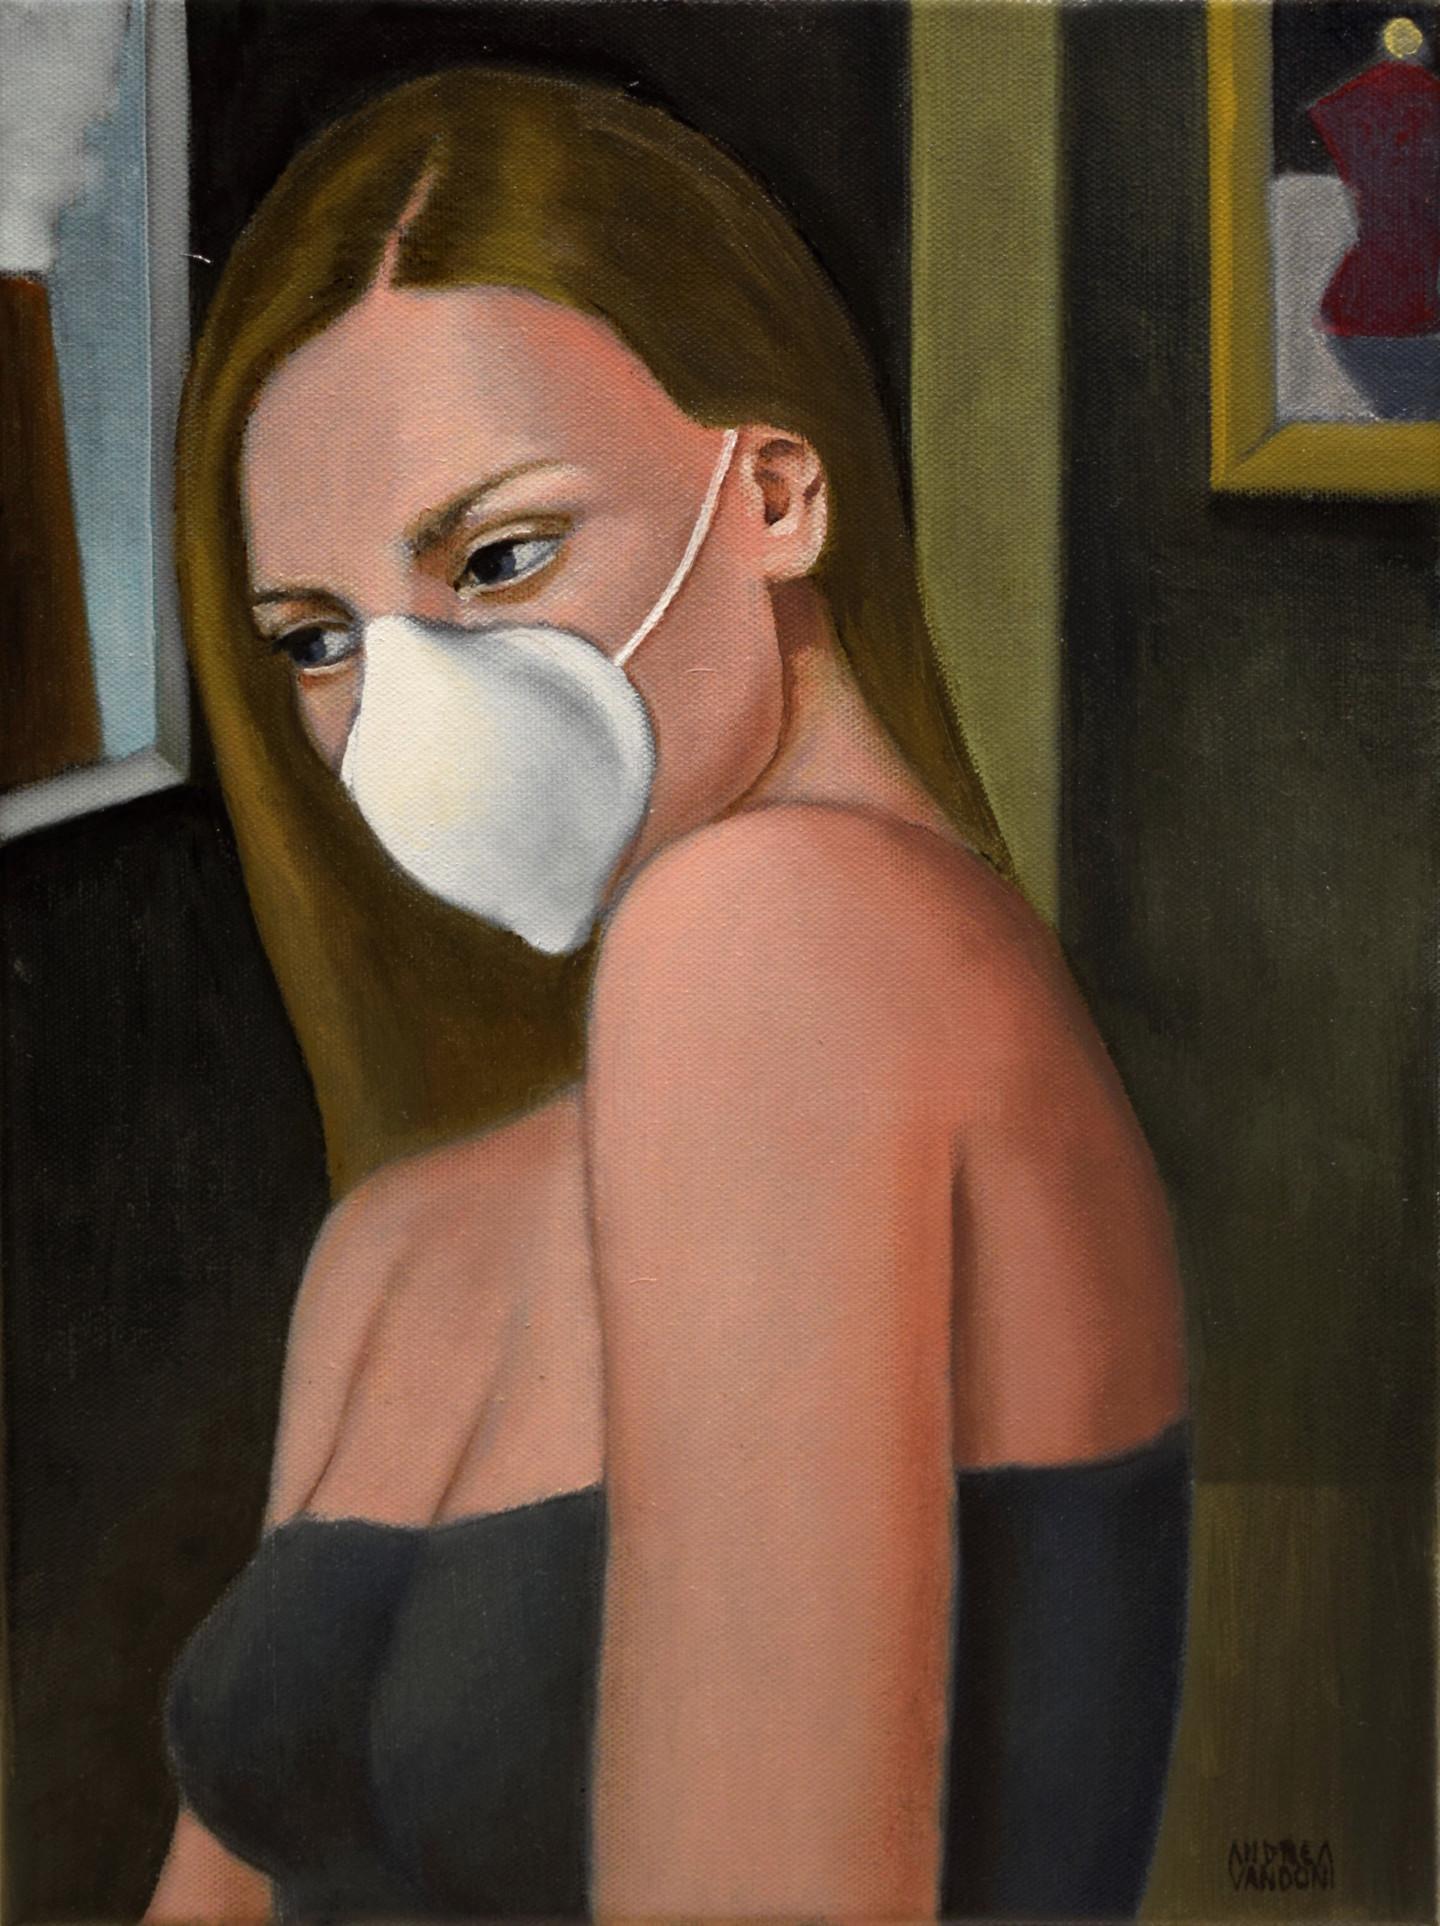 Andrea Vandoni - MUTILATED BEAUTY